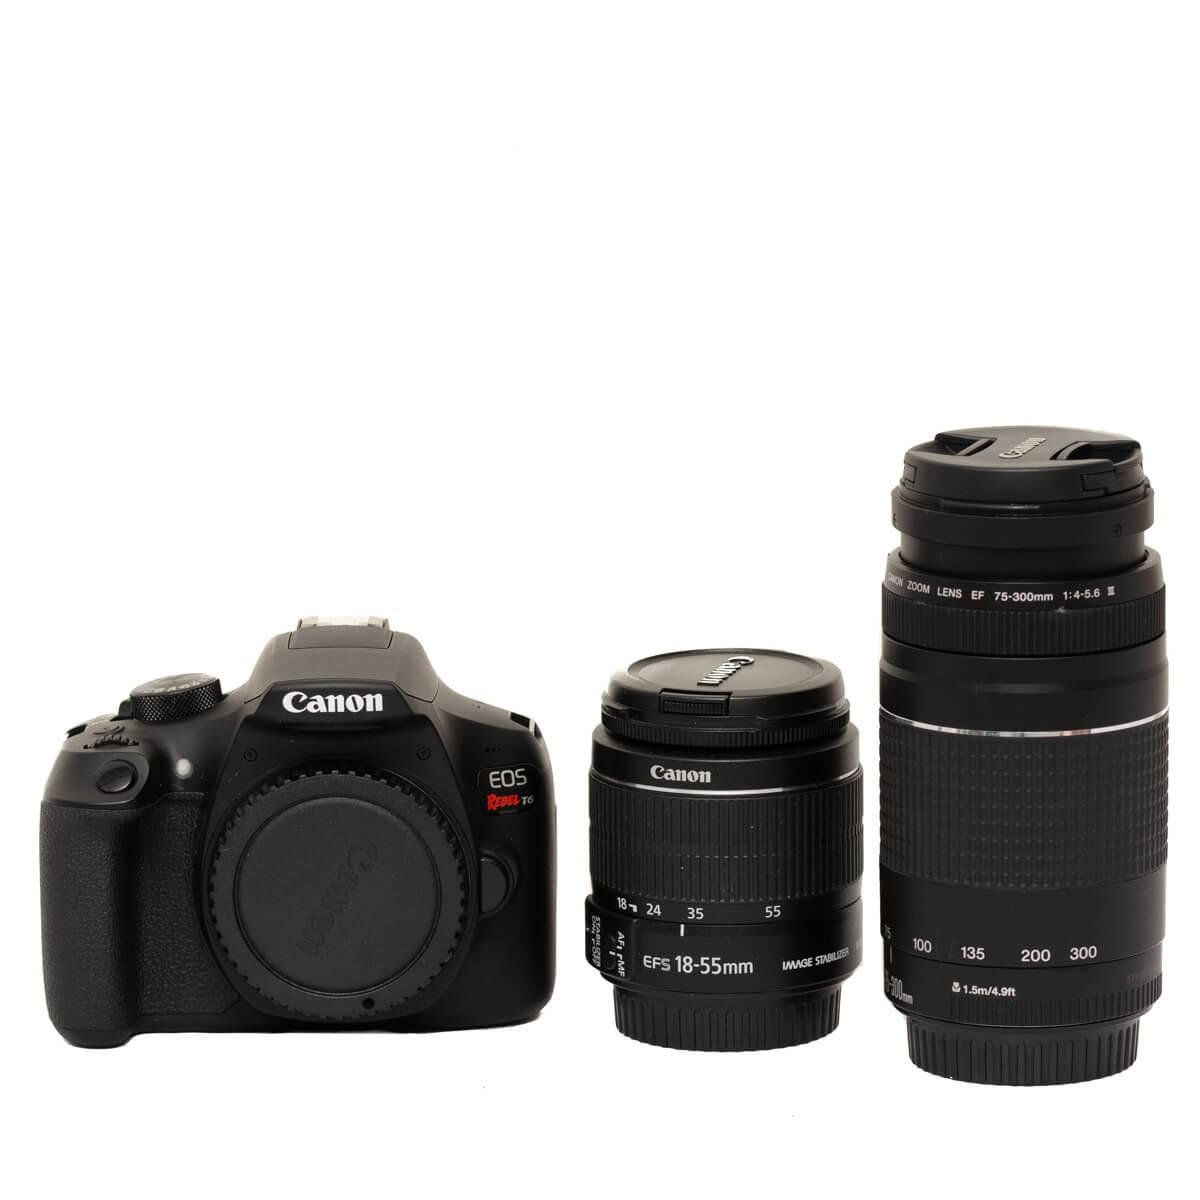 Top 10 Punto Medio Noticias | Canon Eos Rebel T6 1300d Price Philippines